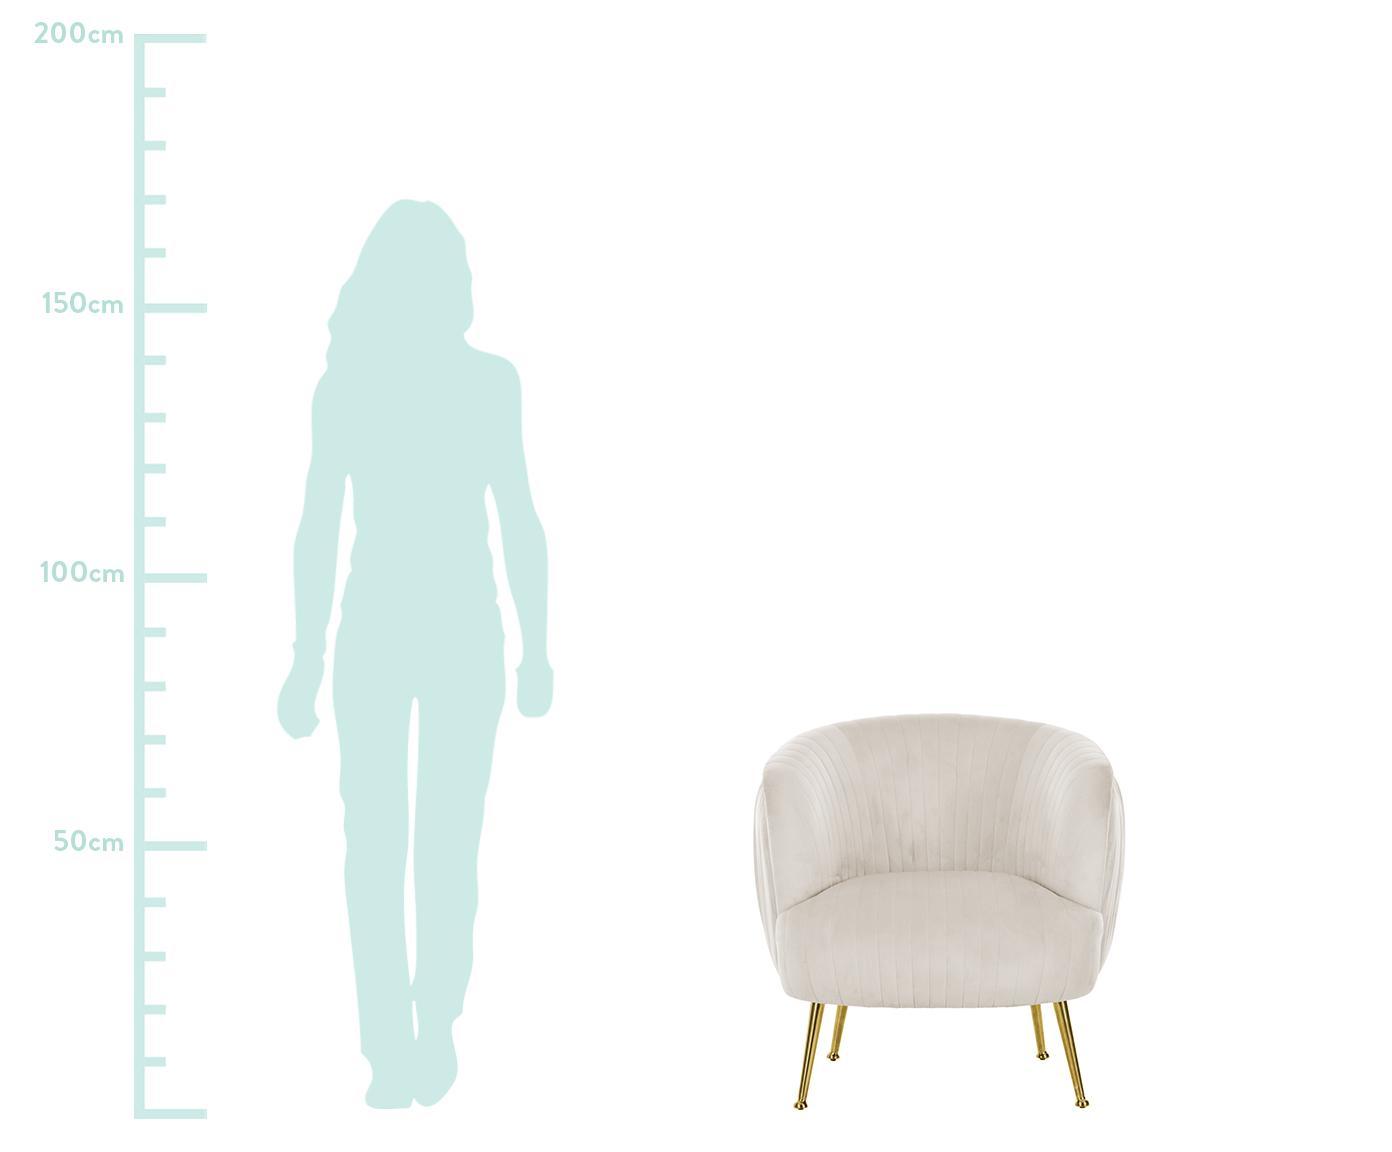 Samt-Cocktailsessel Cara, Bezug: Samt (Polyester) Der hoch, Gestell: Massives Birkenholz, Span, Füße: Metall, beschichtet, Samt Beige, B 81 x T 78 cm